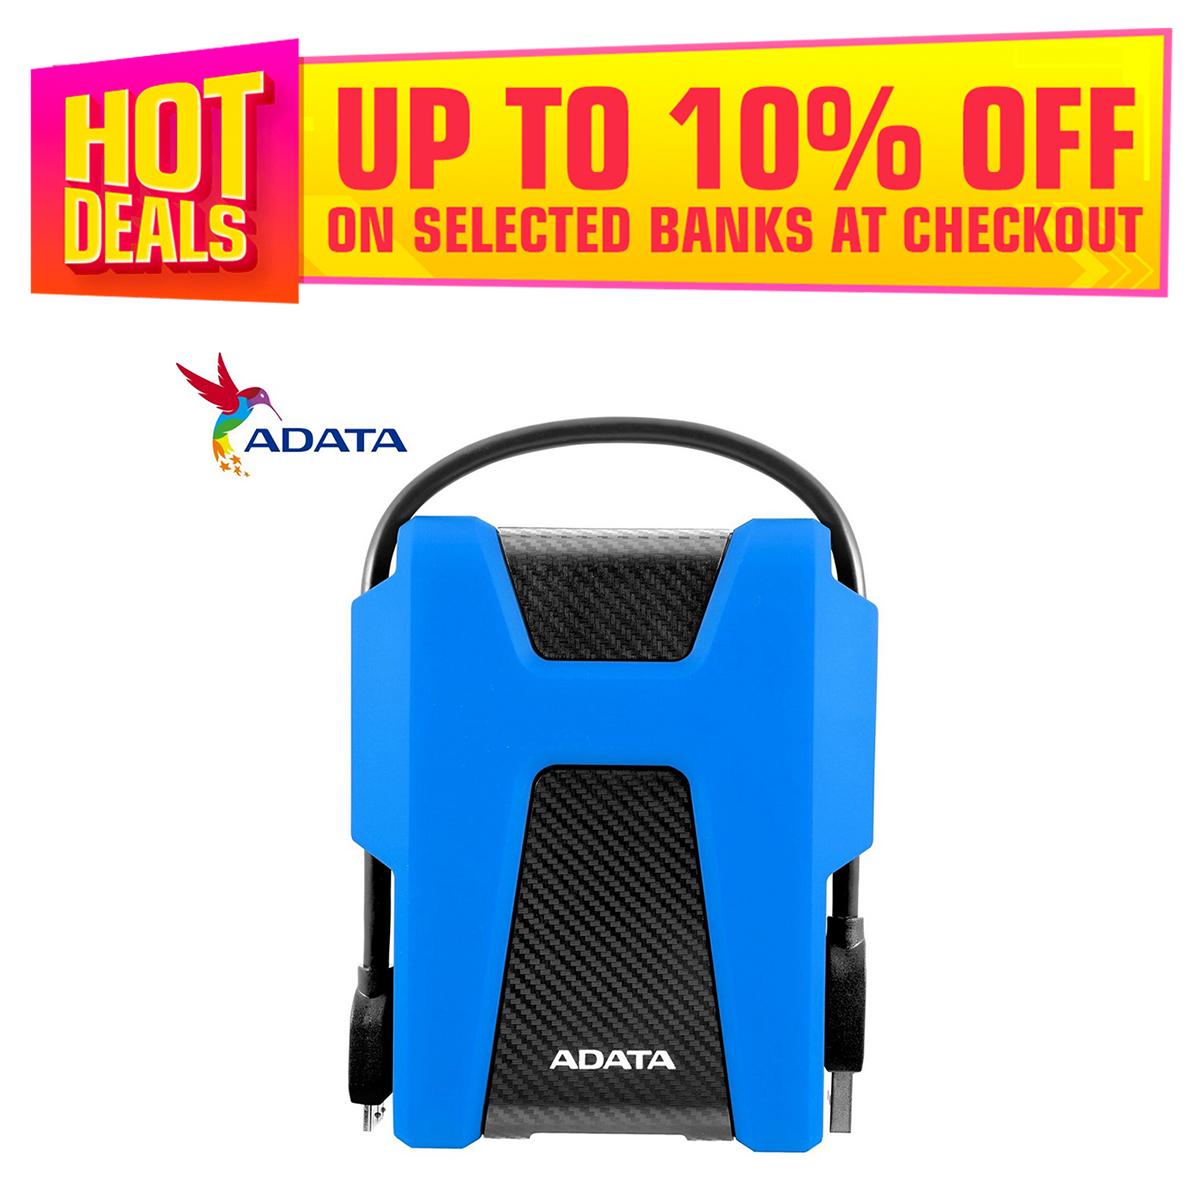 ADATA 2TB HD680 USB 3.2 Gen1 Military-Grade Shock-Proof External Portable Hard Drive Blue